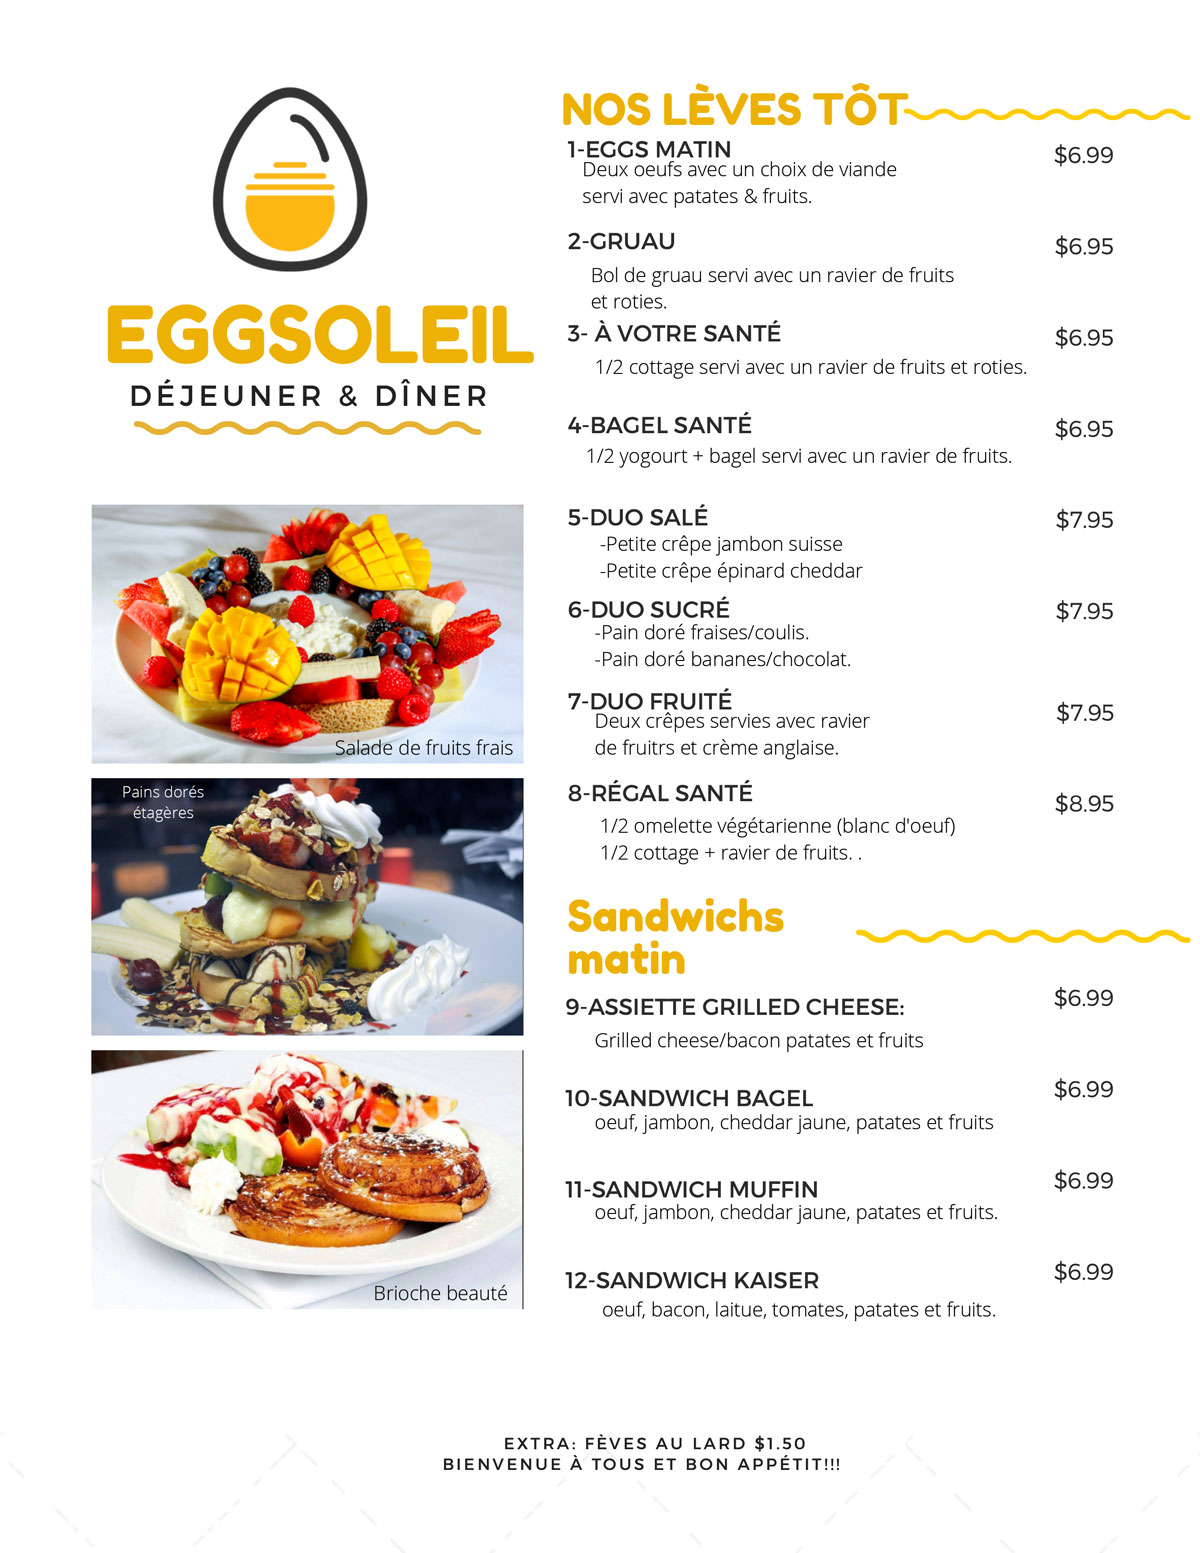 egg-soleil-dejeuner-7